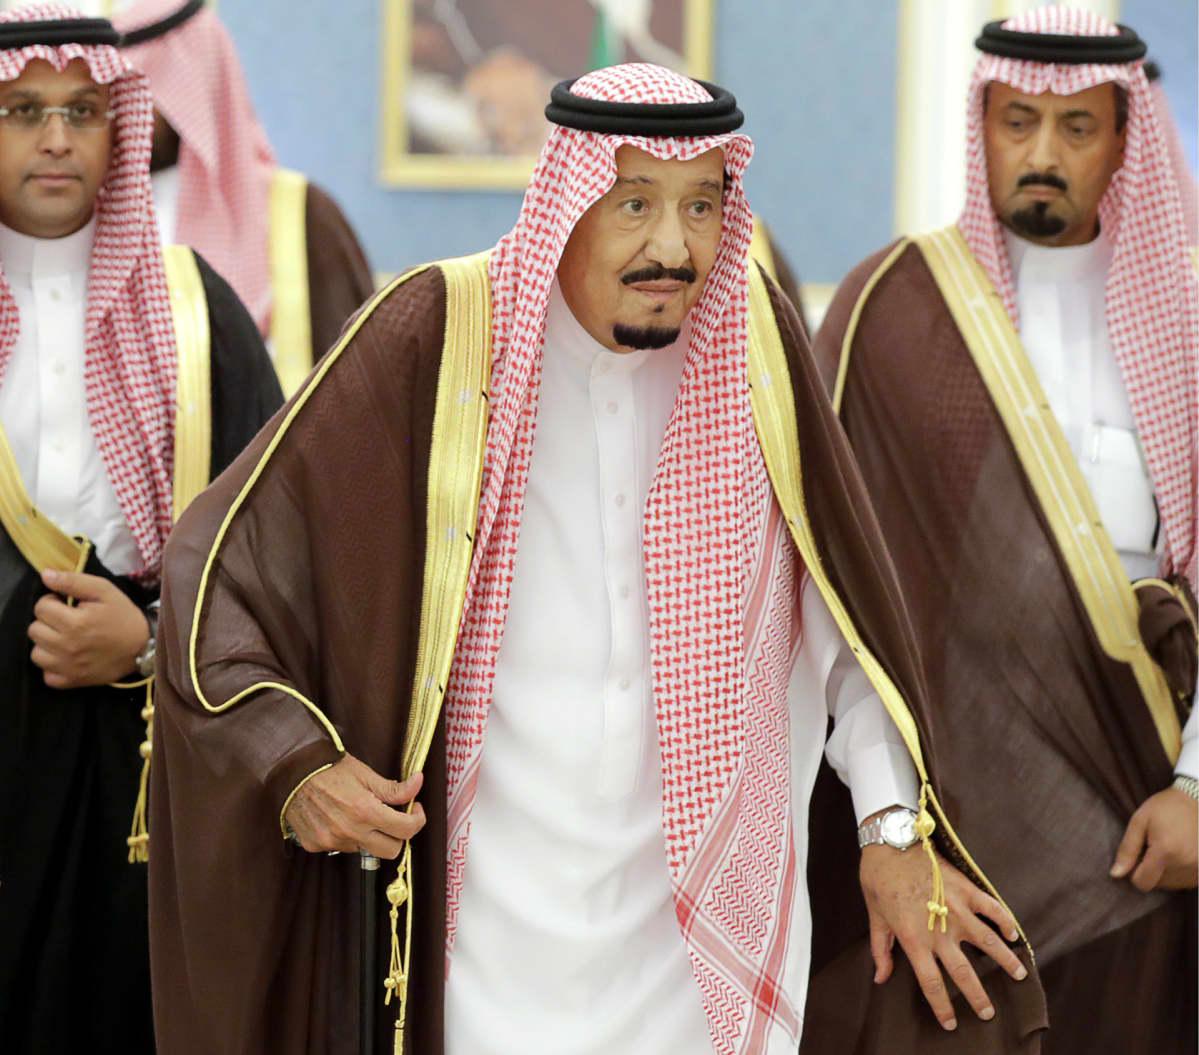 Salman bin Abdulaziz Al Sau